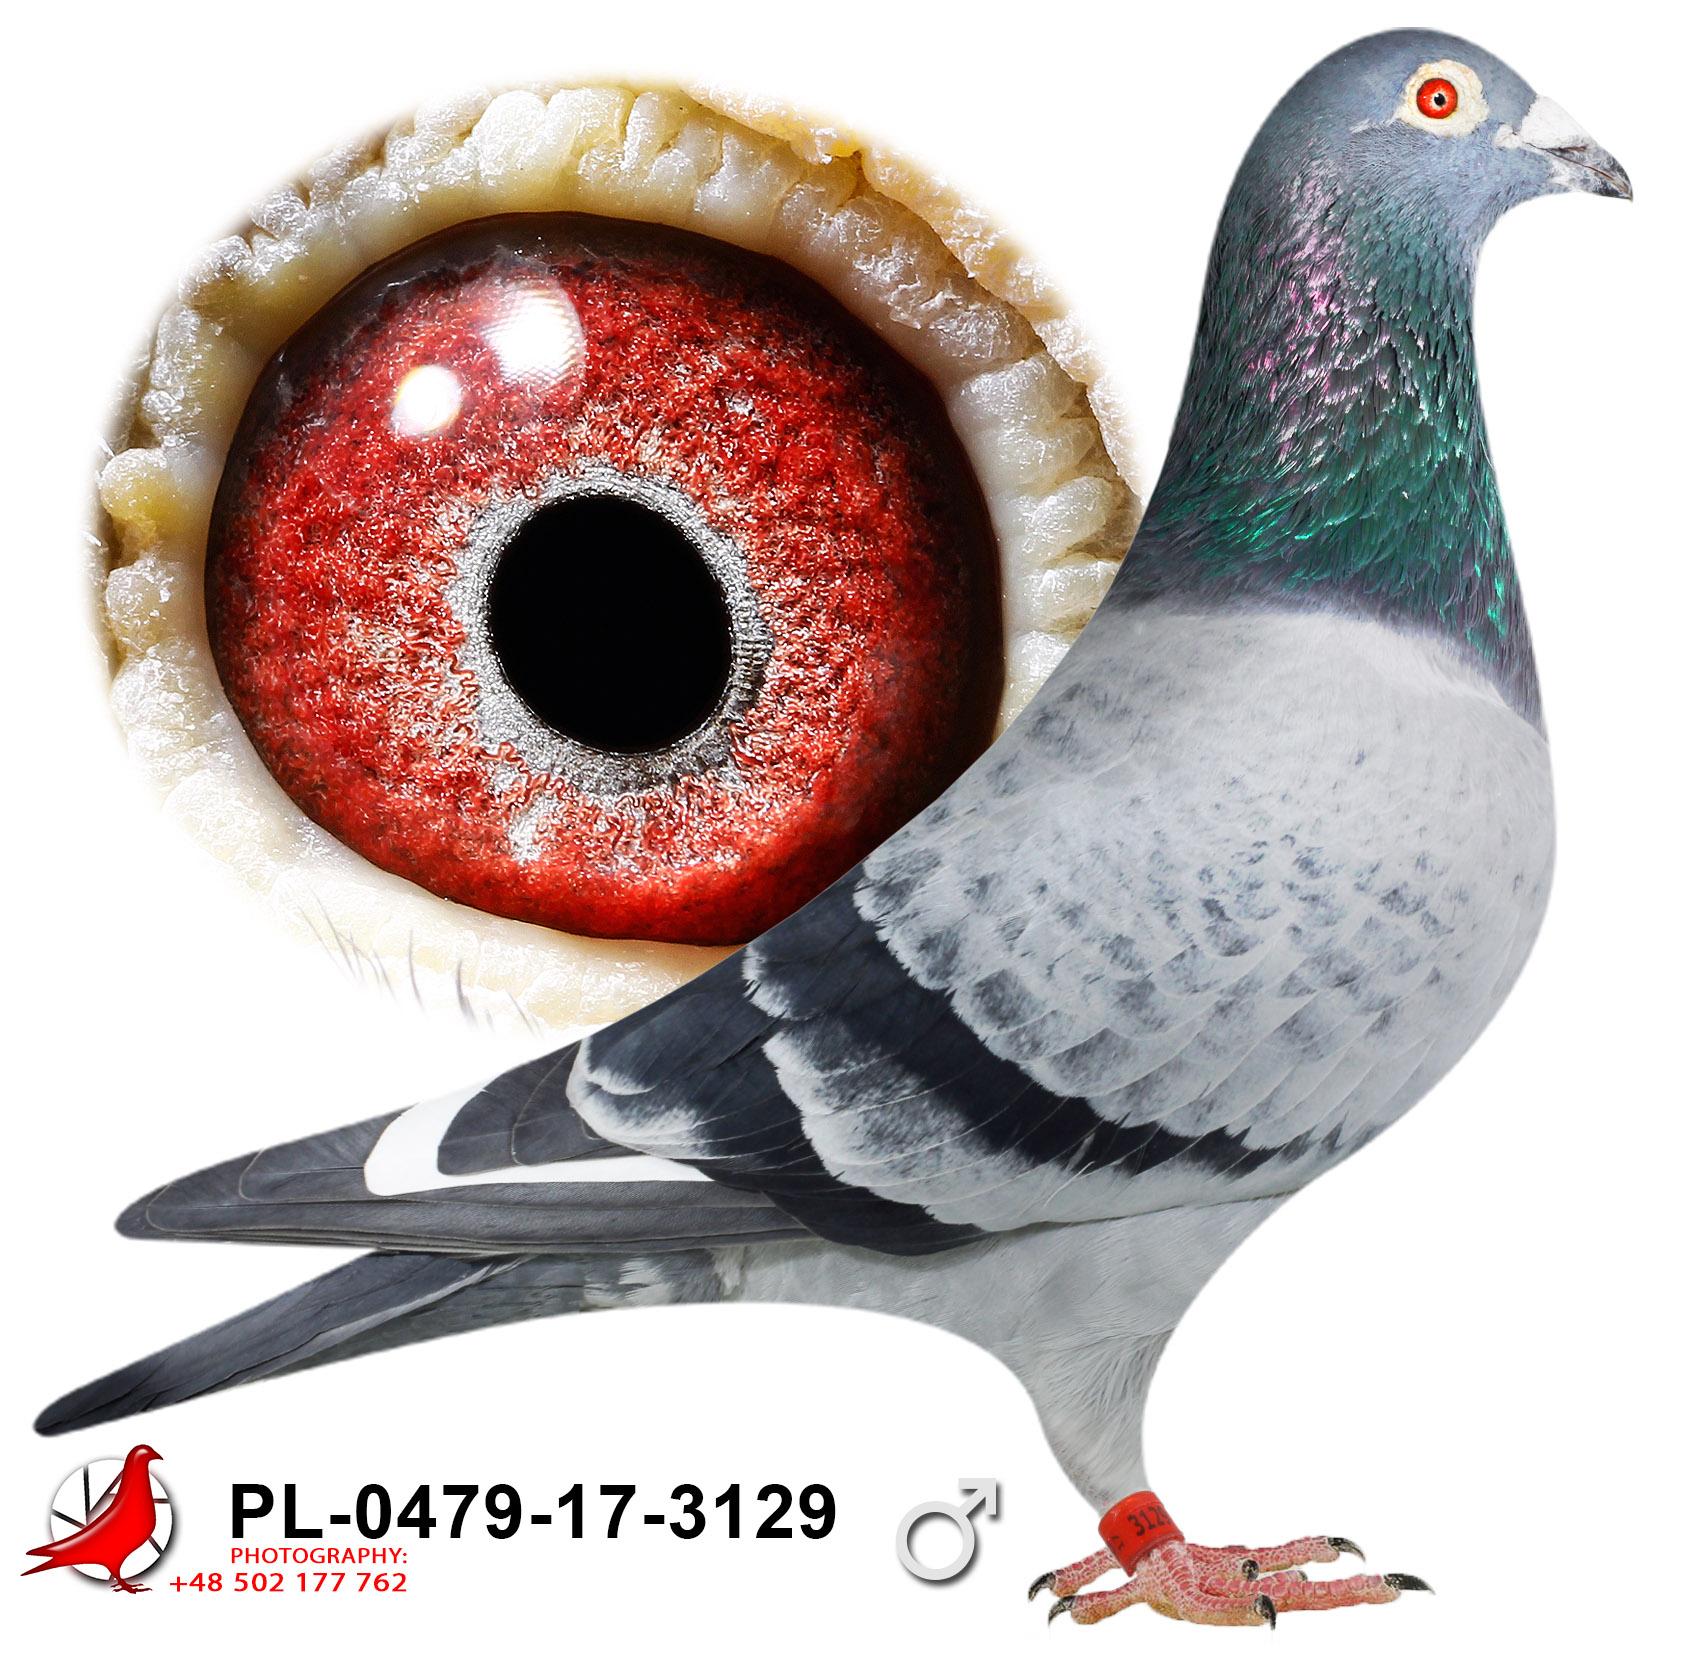 pl-0479-17-3129_c